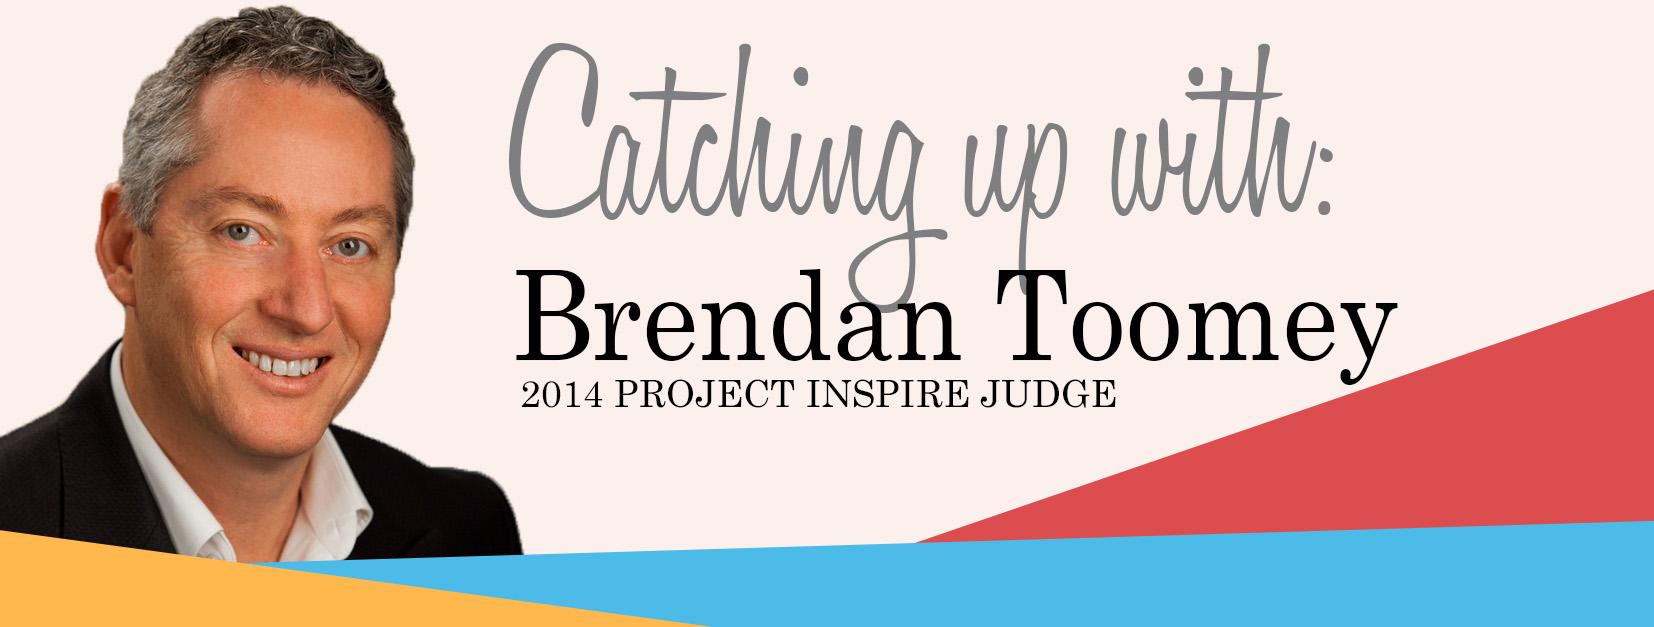 Judge - Brendan Toomey